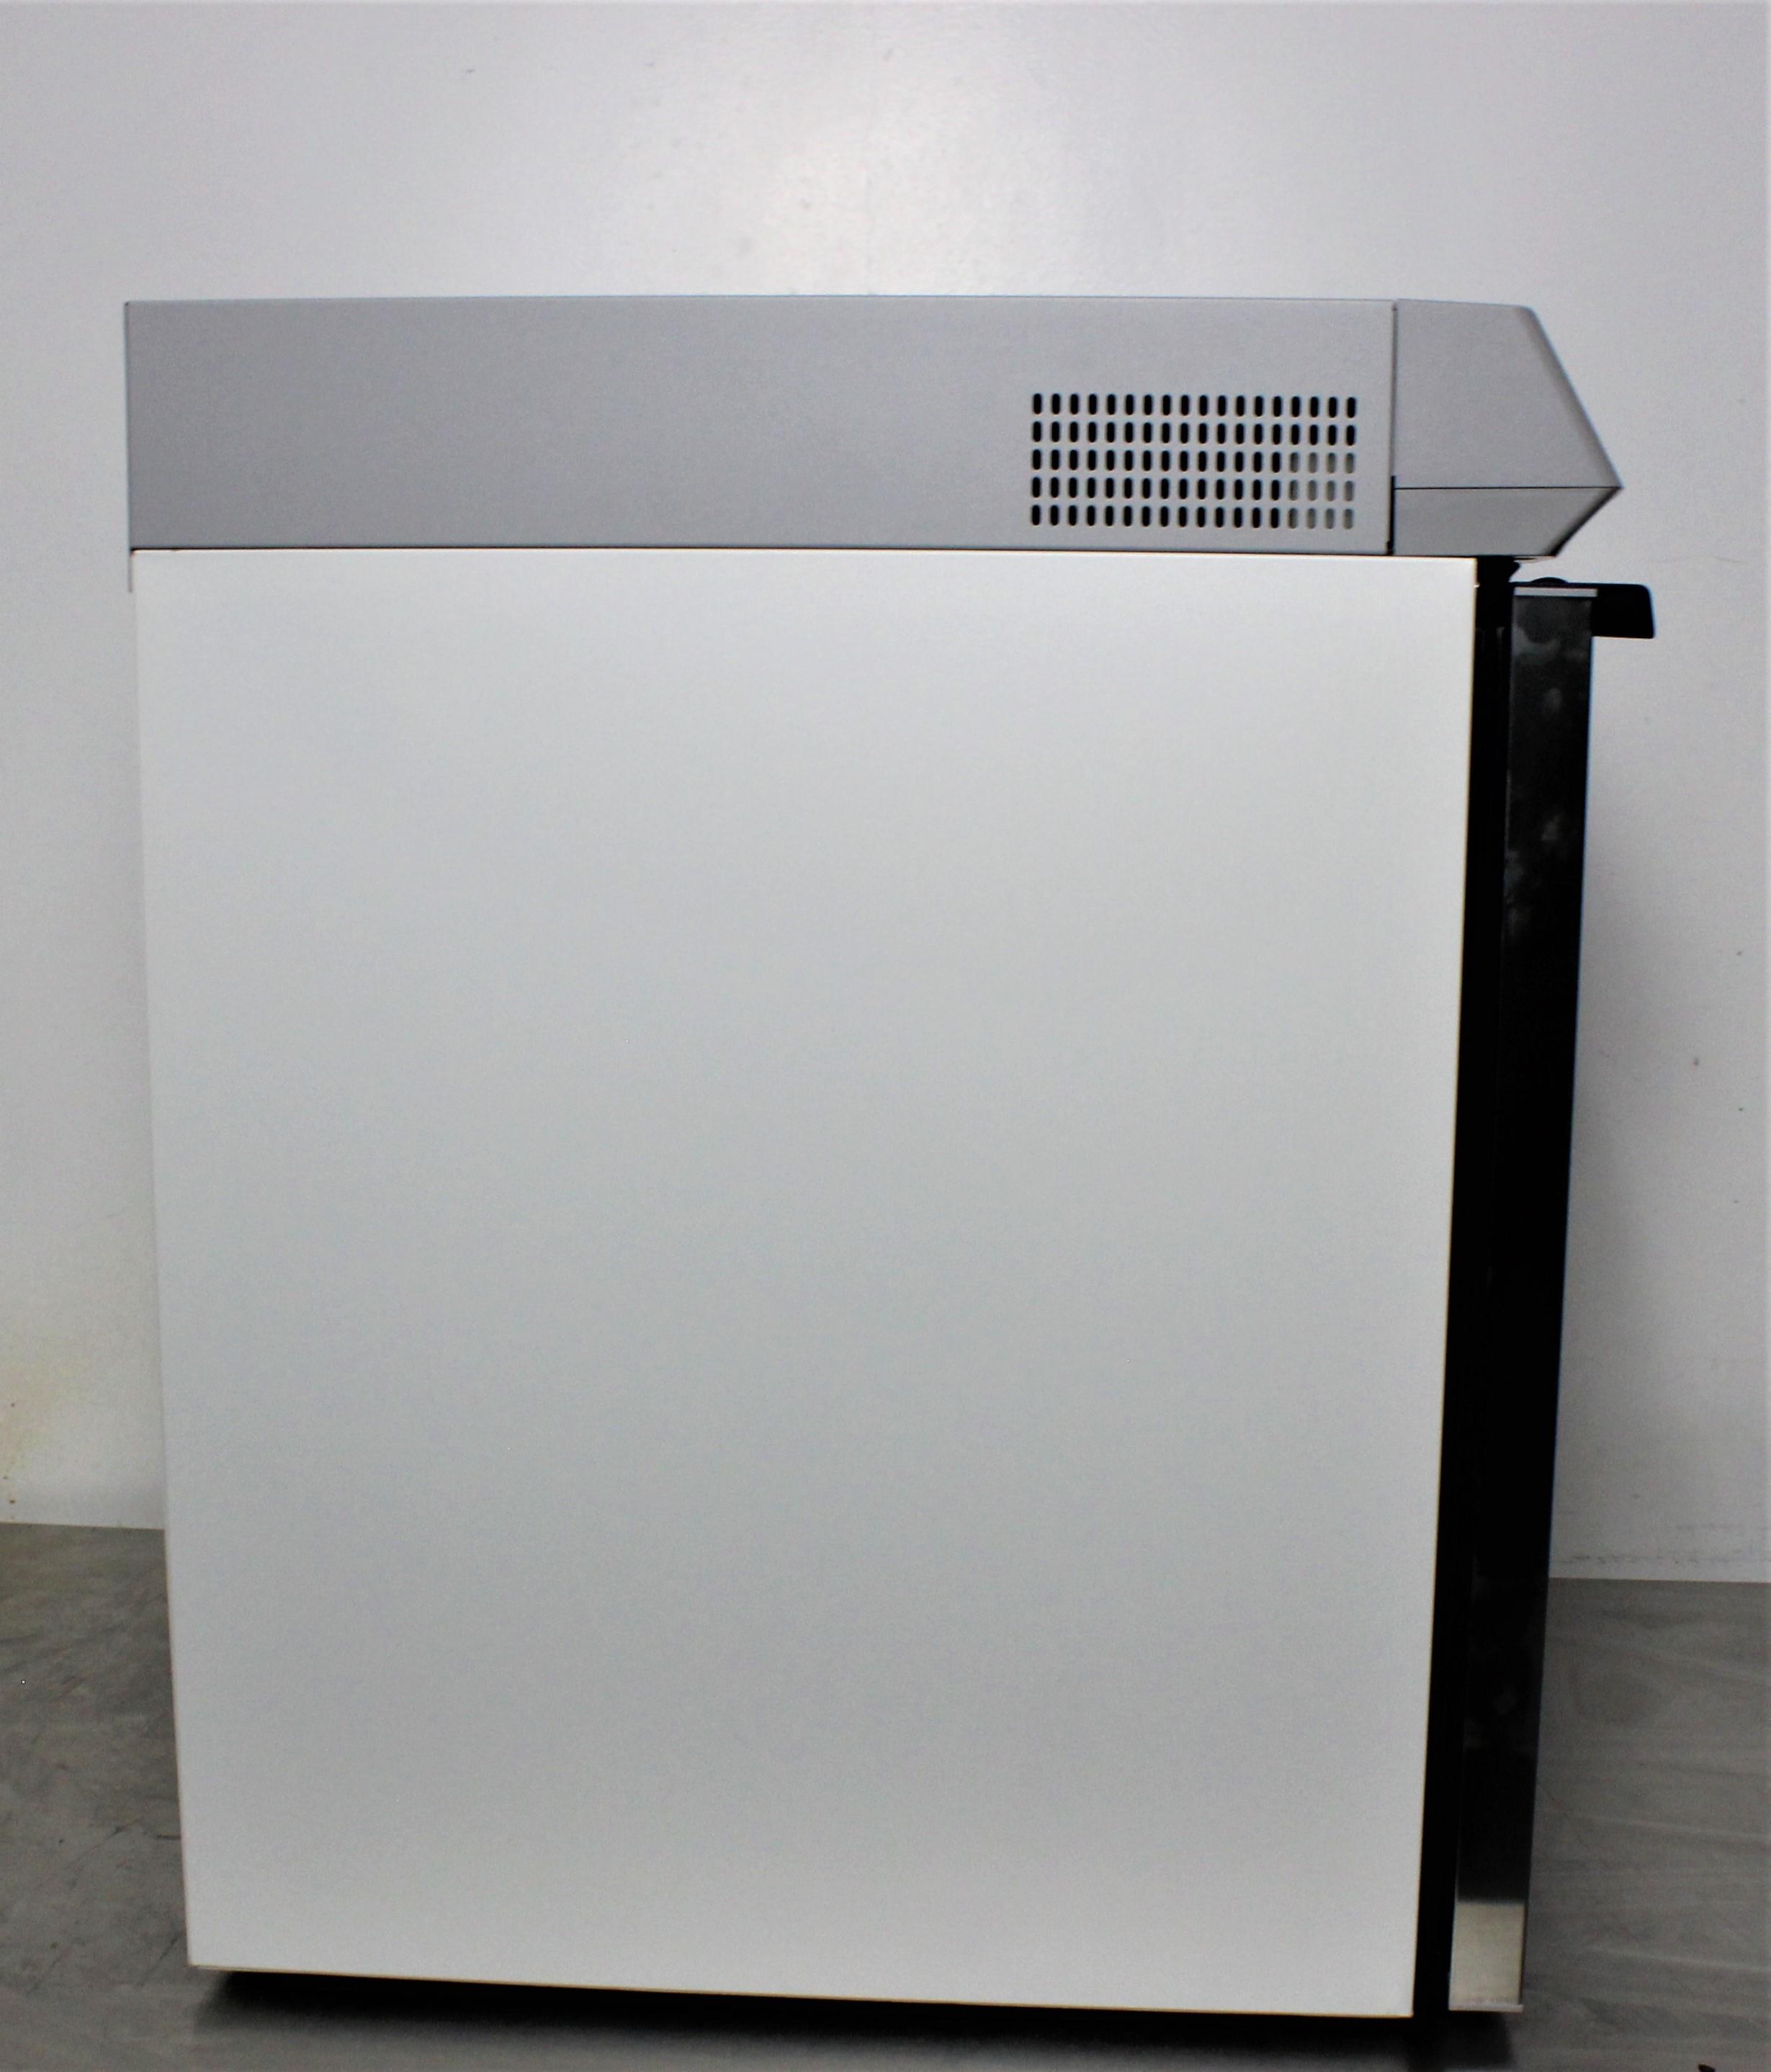 Image THERMO SCIENTIFIC TSX505GA High-Performance Undercounter Refrigerator 1587106